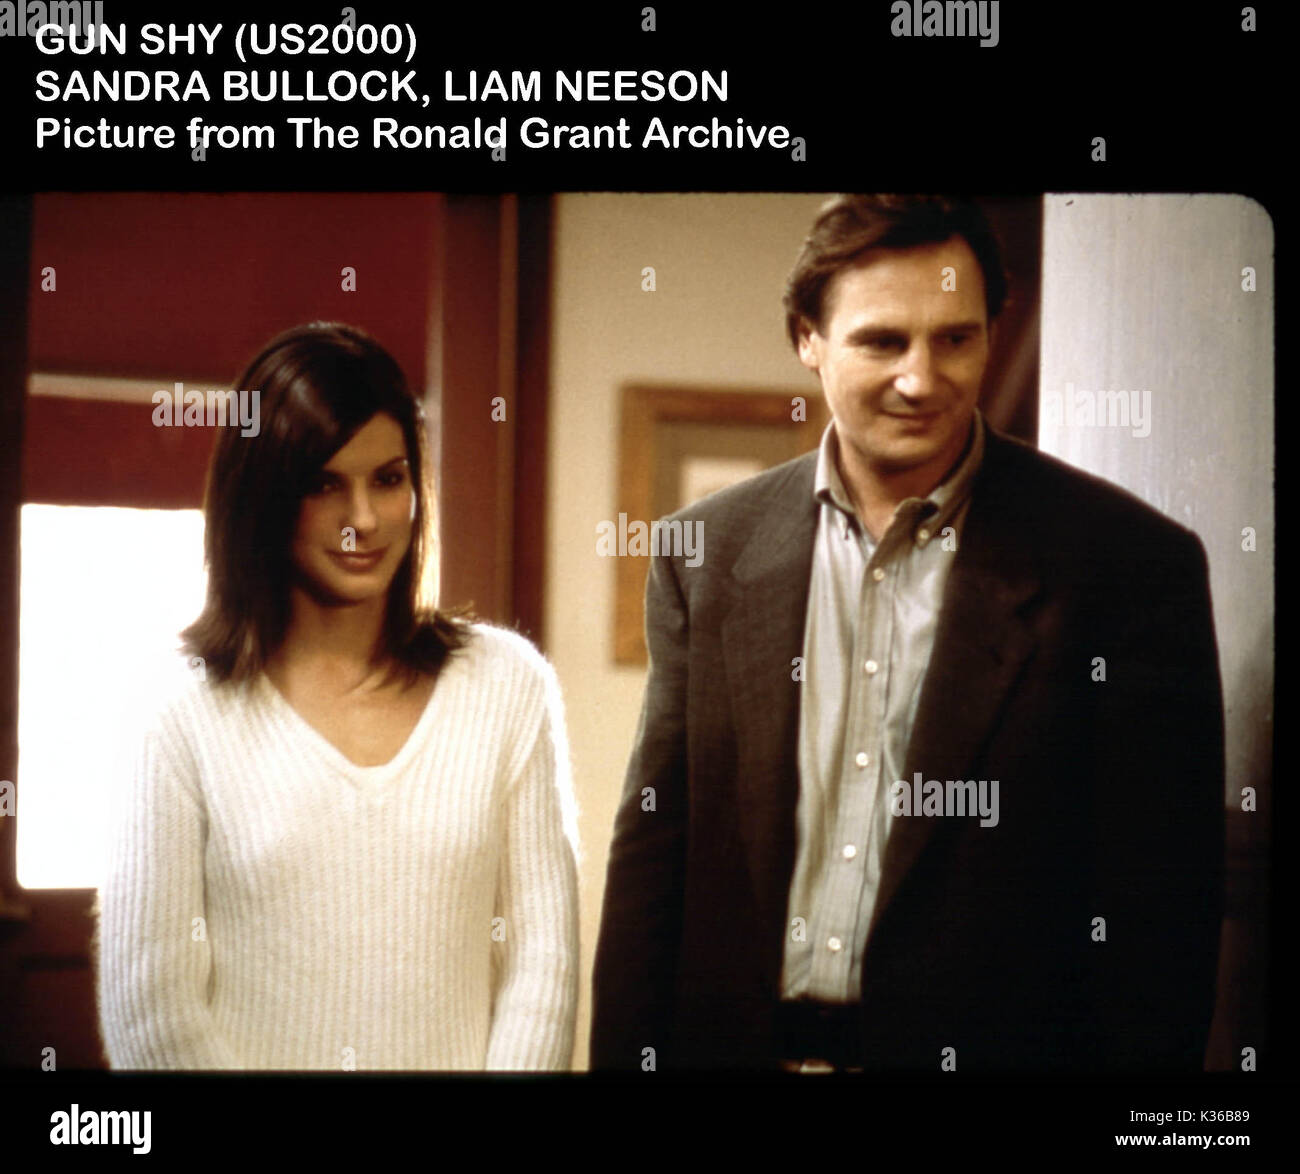 Sandra bullock dating liam neeson